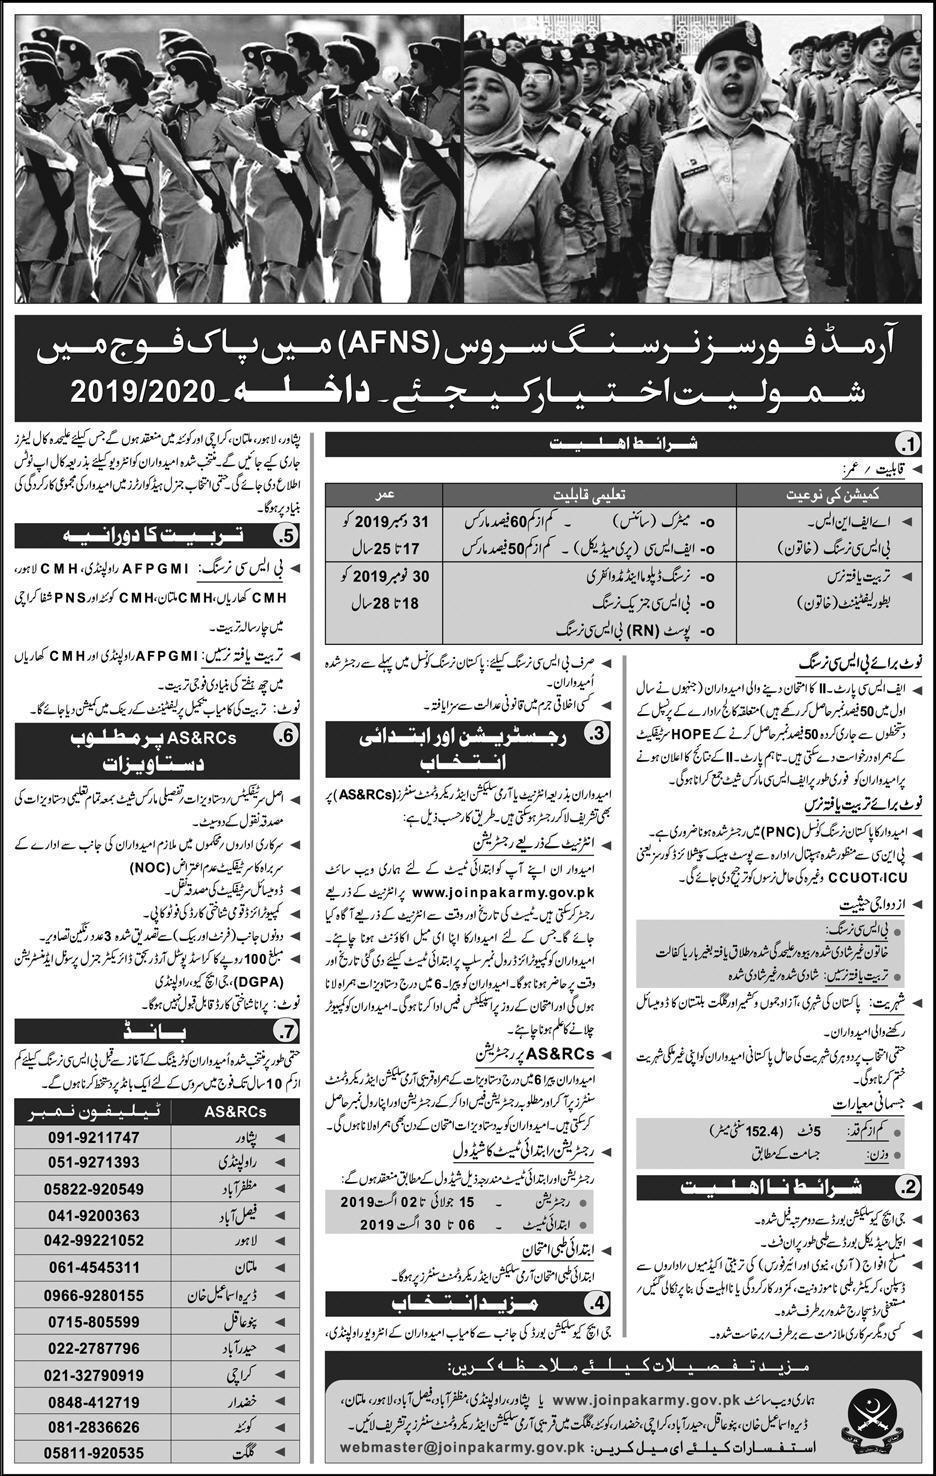 Nursing Jobs in Pakistan Army 2019 Online Apply